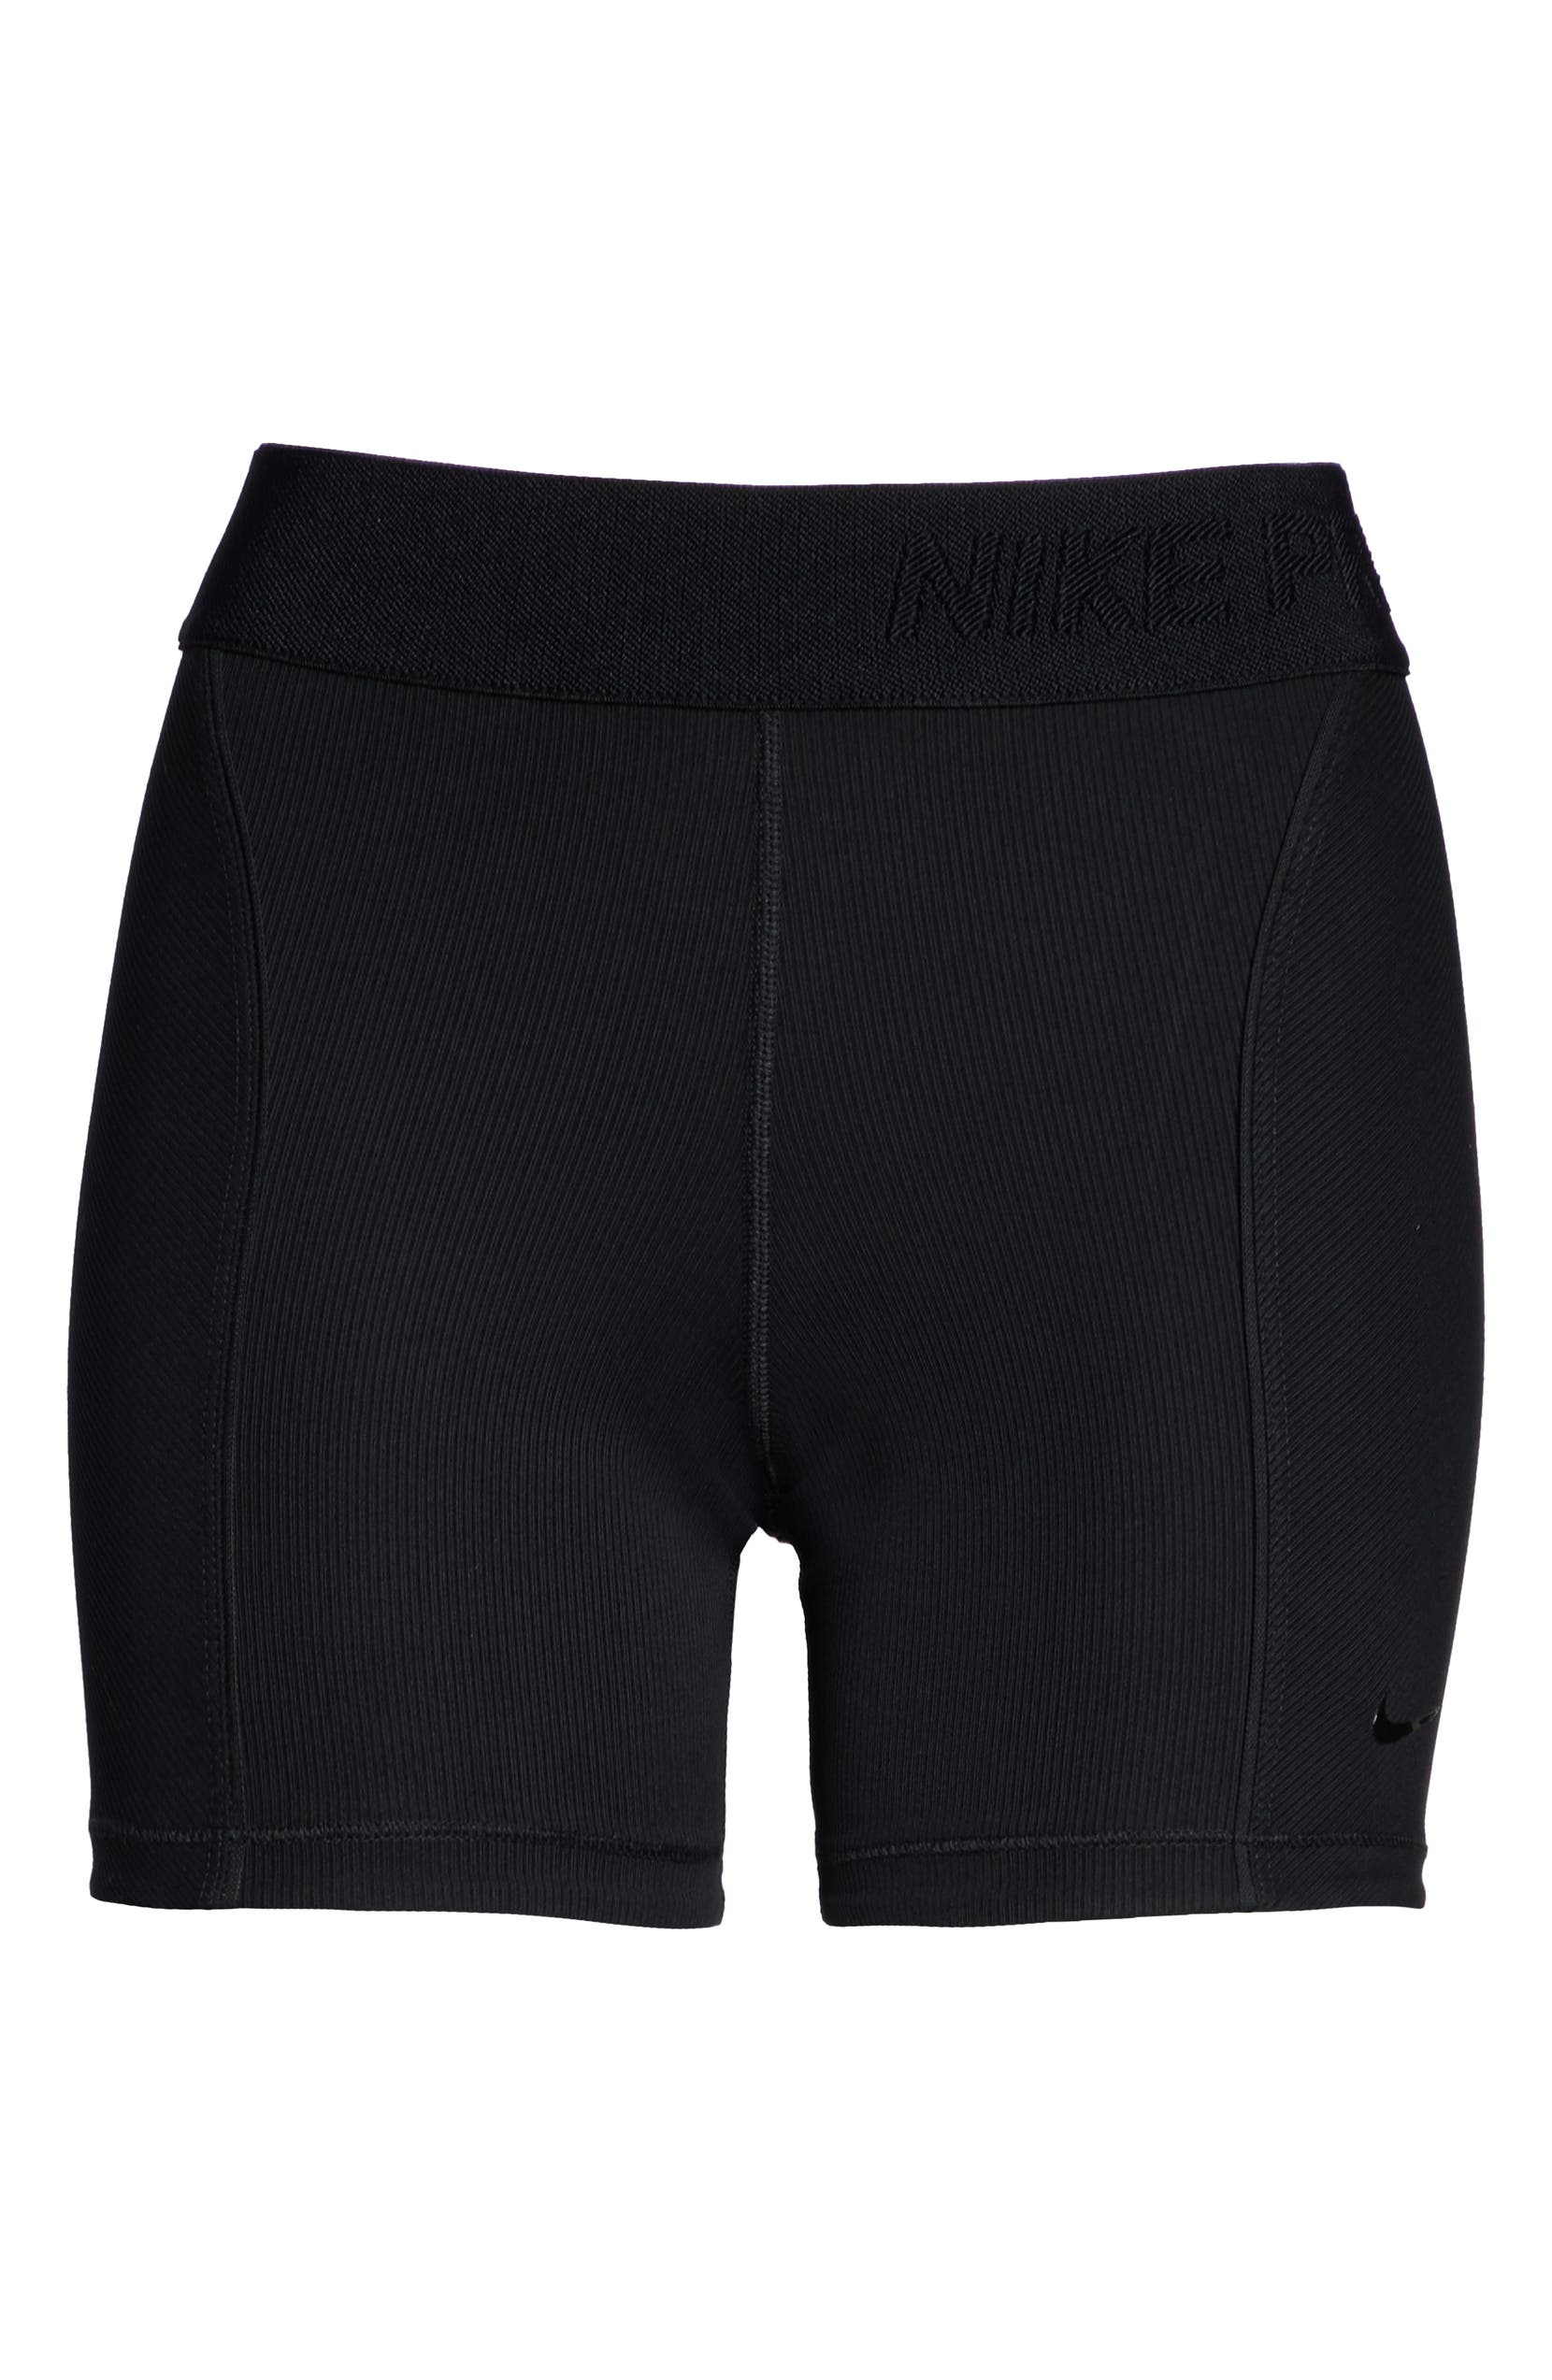 9917c4a5d86d9 Nike Pro HyperCool Women's Ribbed Shorts | Nordstrom